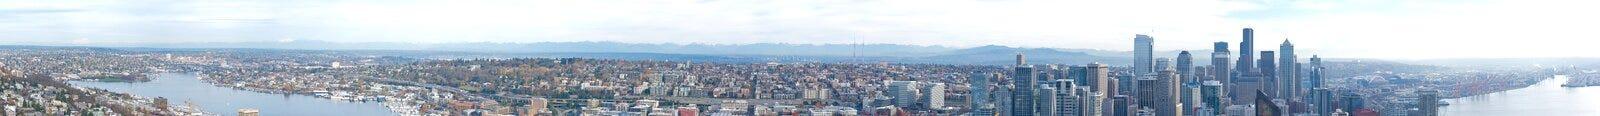 Seattle Panorama Stock Photos